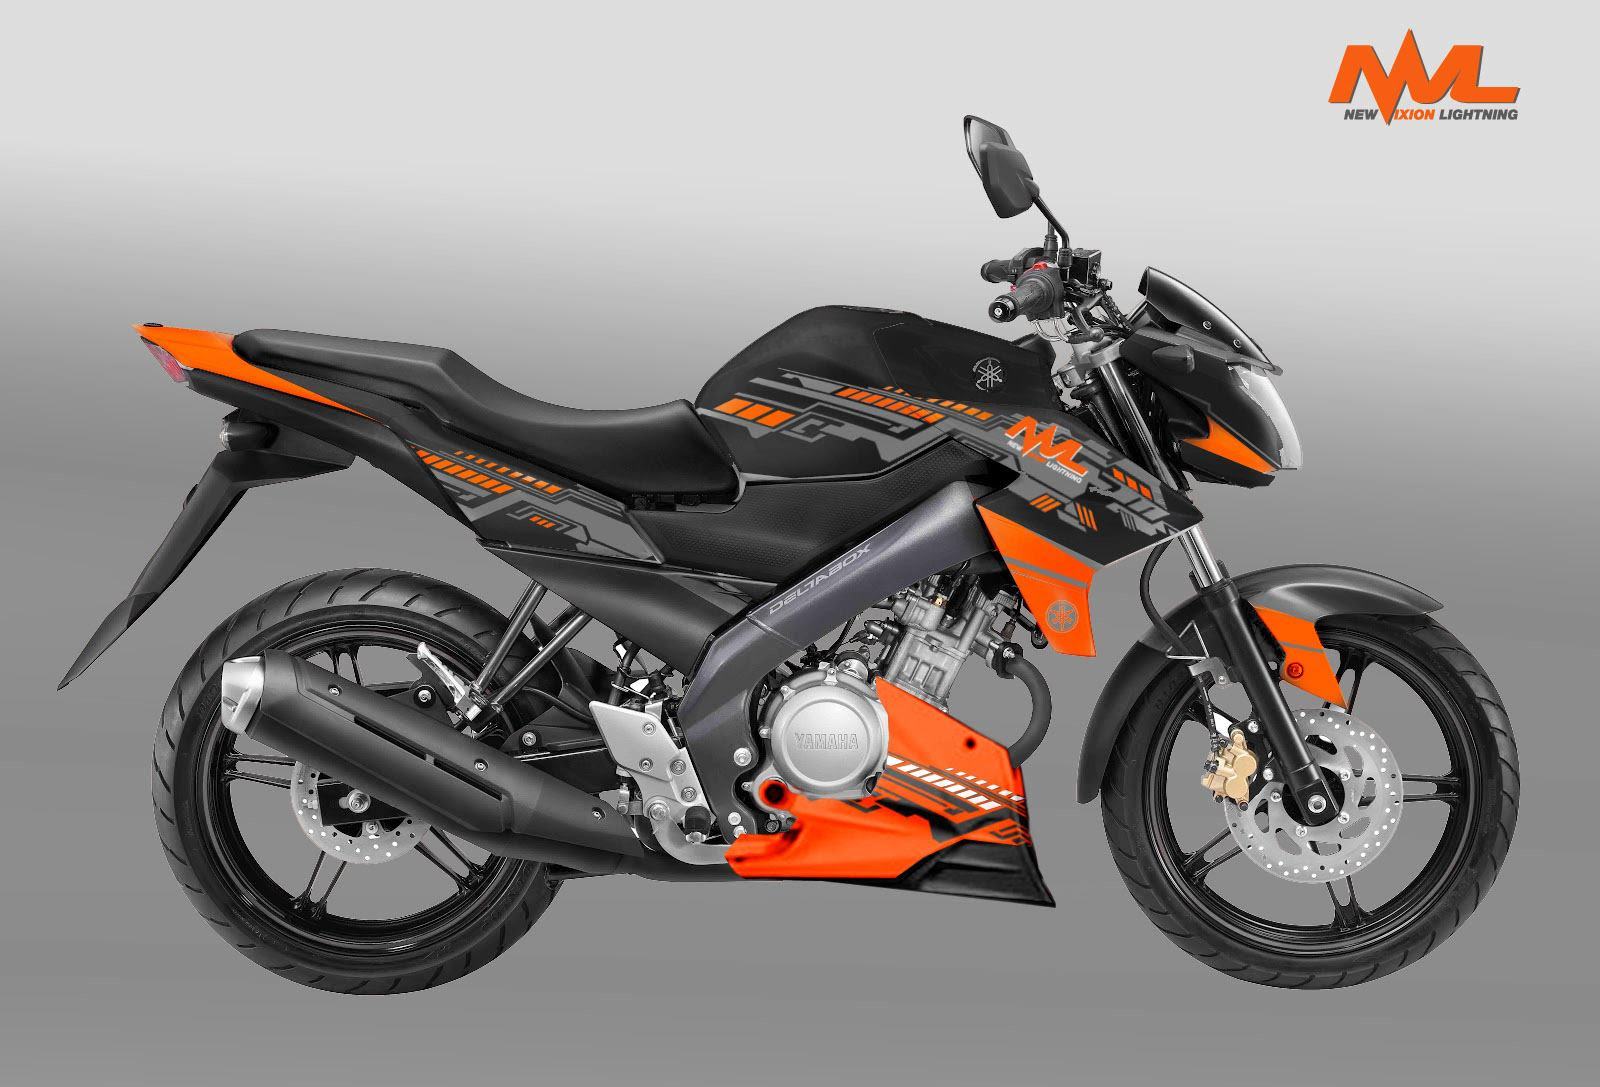 Modif Motor Yamaha Modifikasi Motor Terbaru